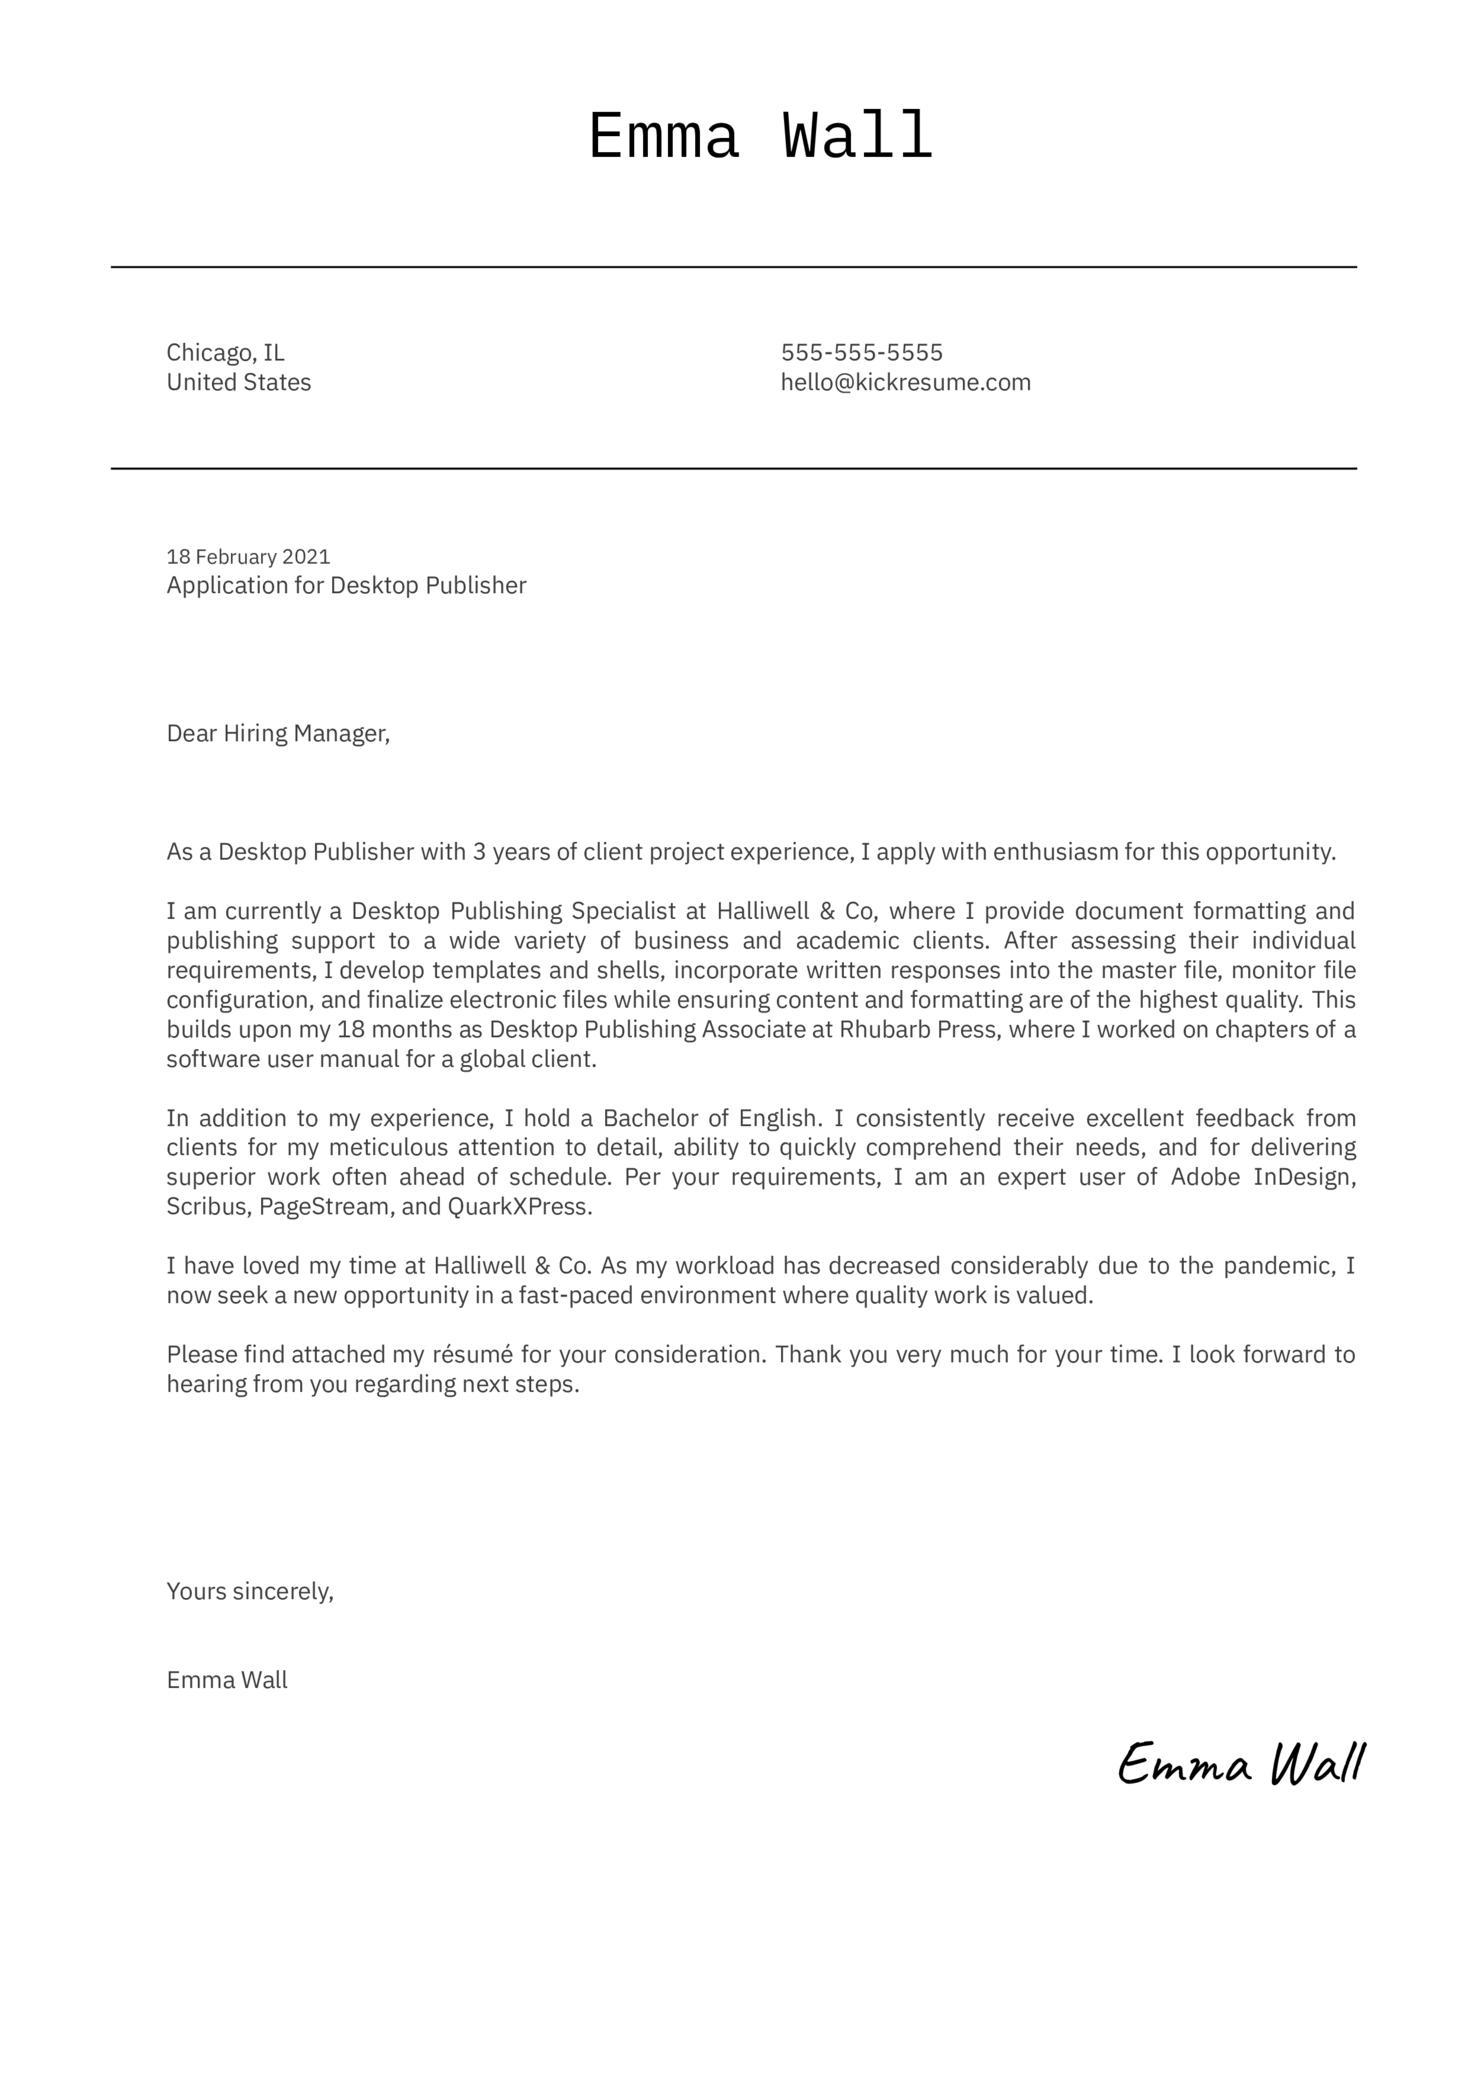 Desktop Publisher Cover Letter Sample